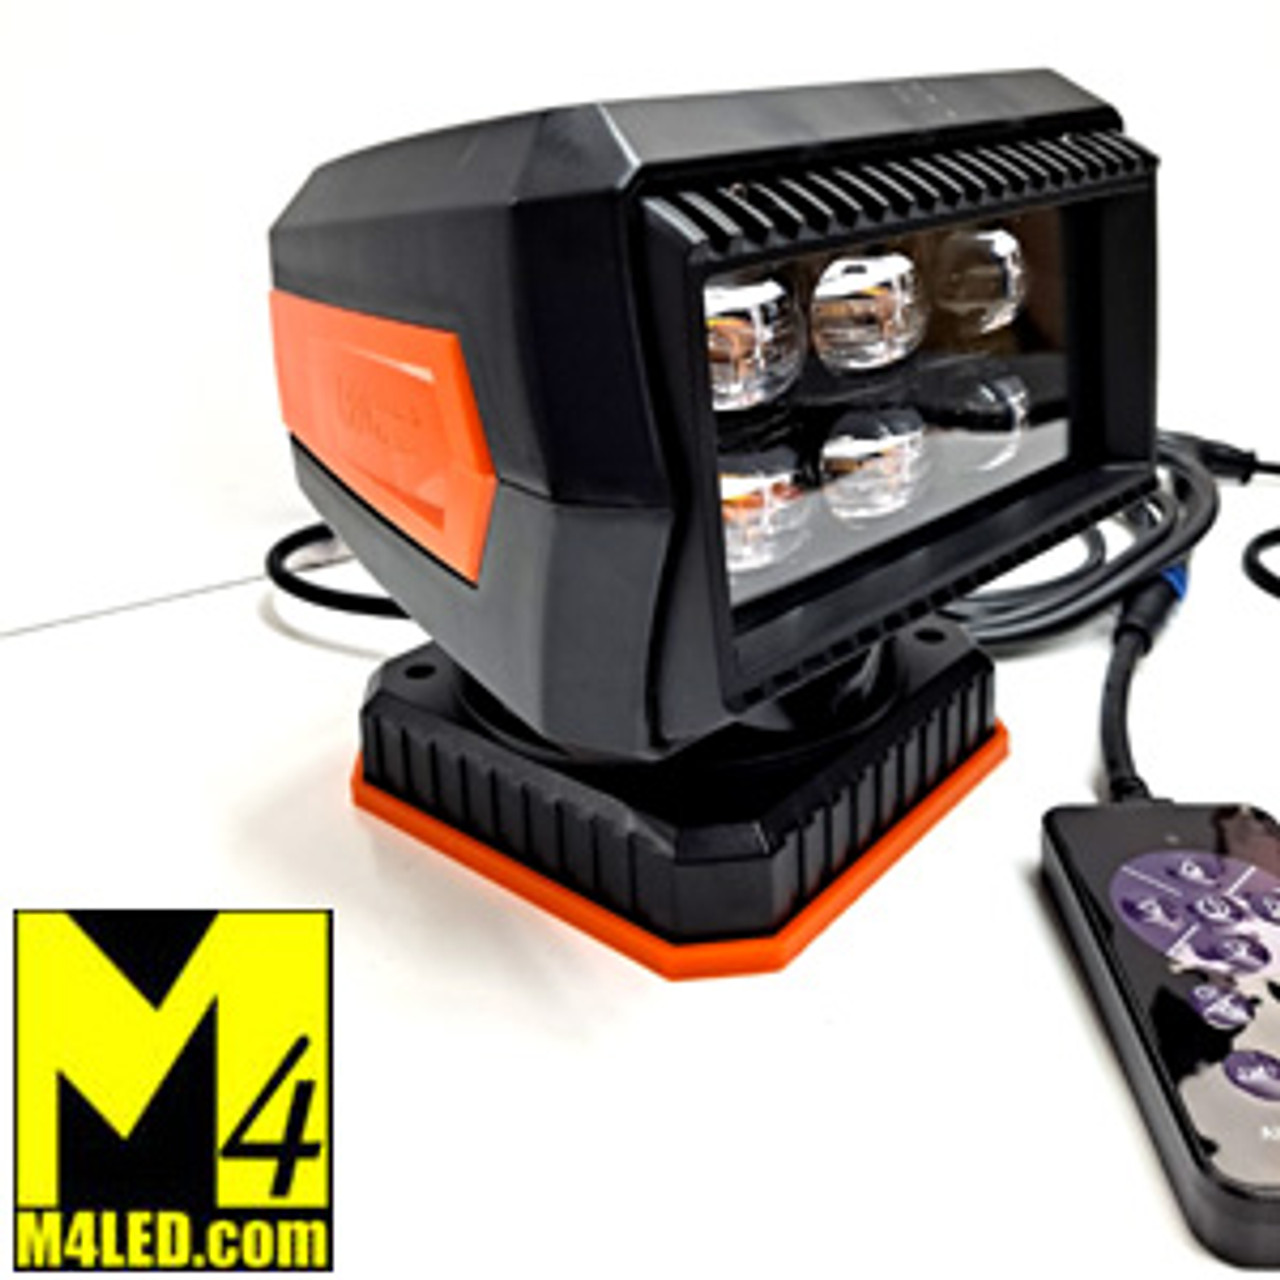 Motorized 60 Watt Spotlight with Wired Remote